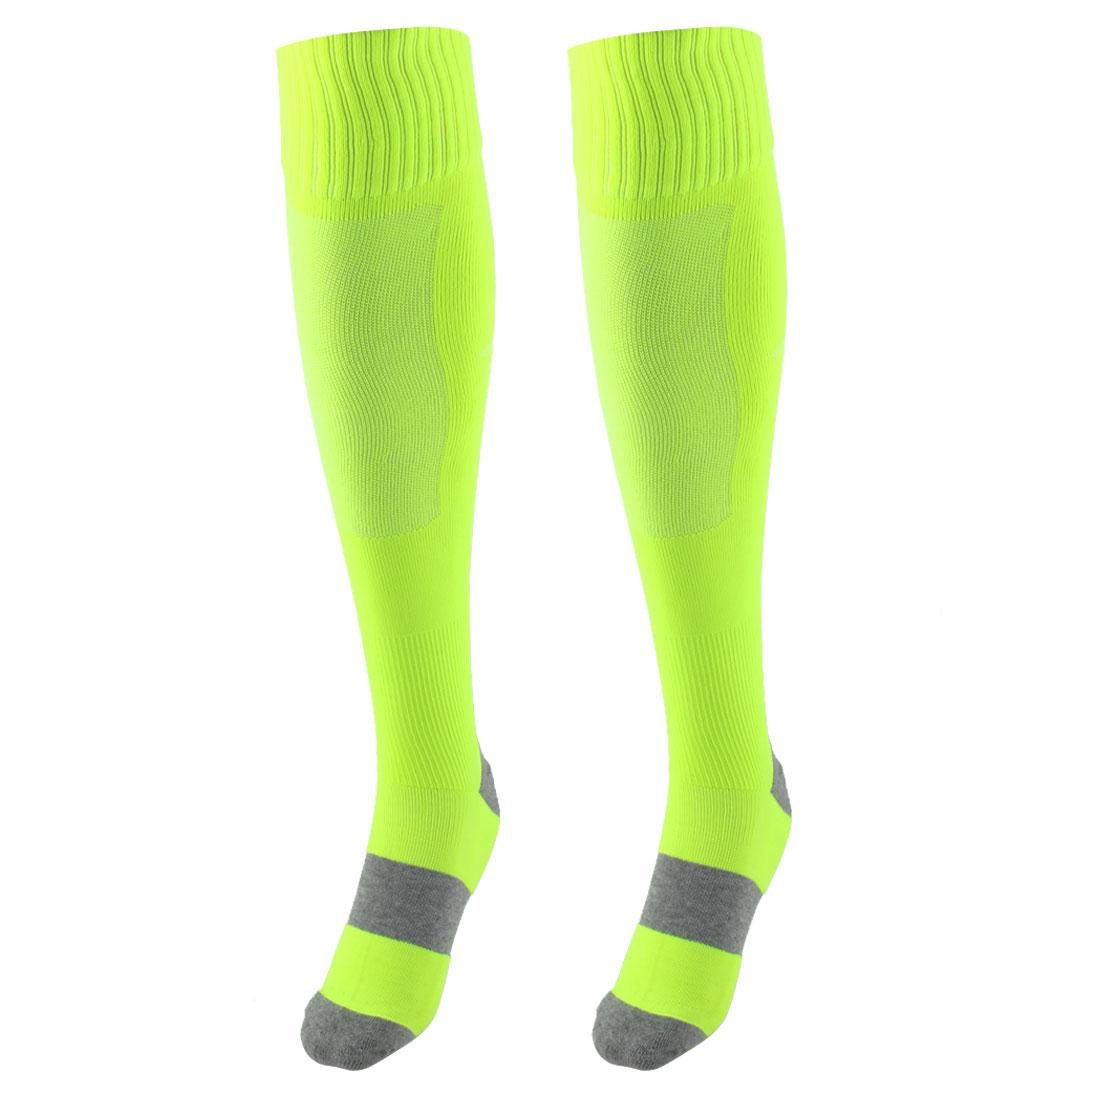 Unisex Outdoor Sports Nylon Non Slip Stretch Rugby Soccer Football Long Socks Fluorescent Green Pair